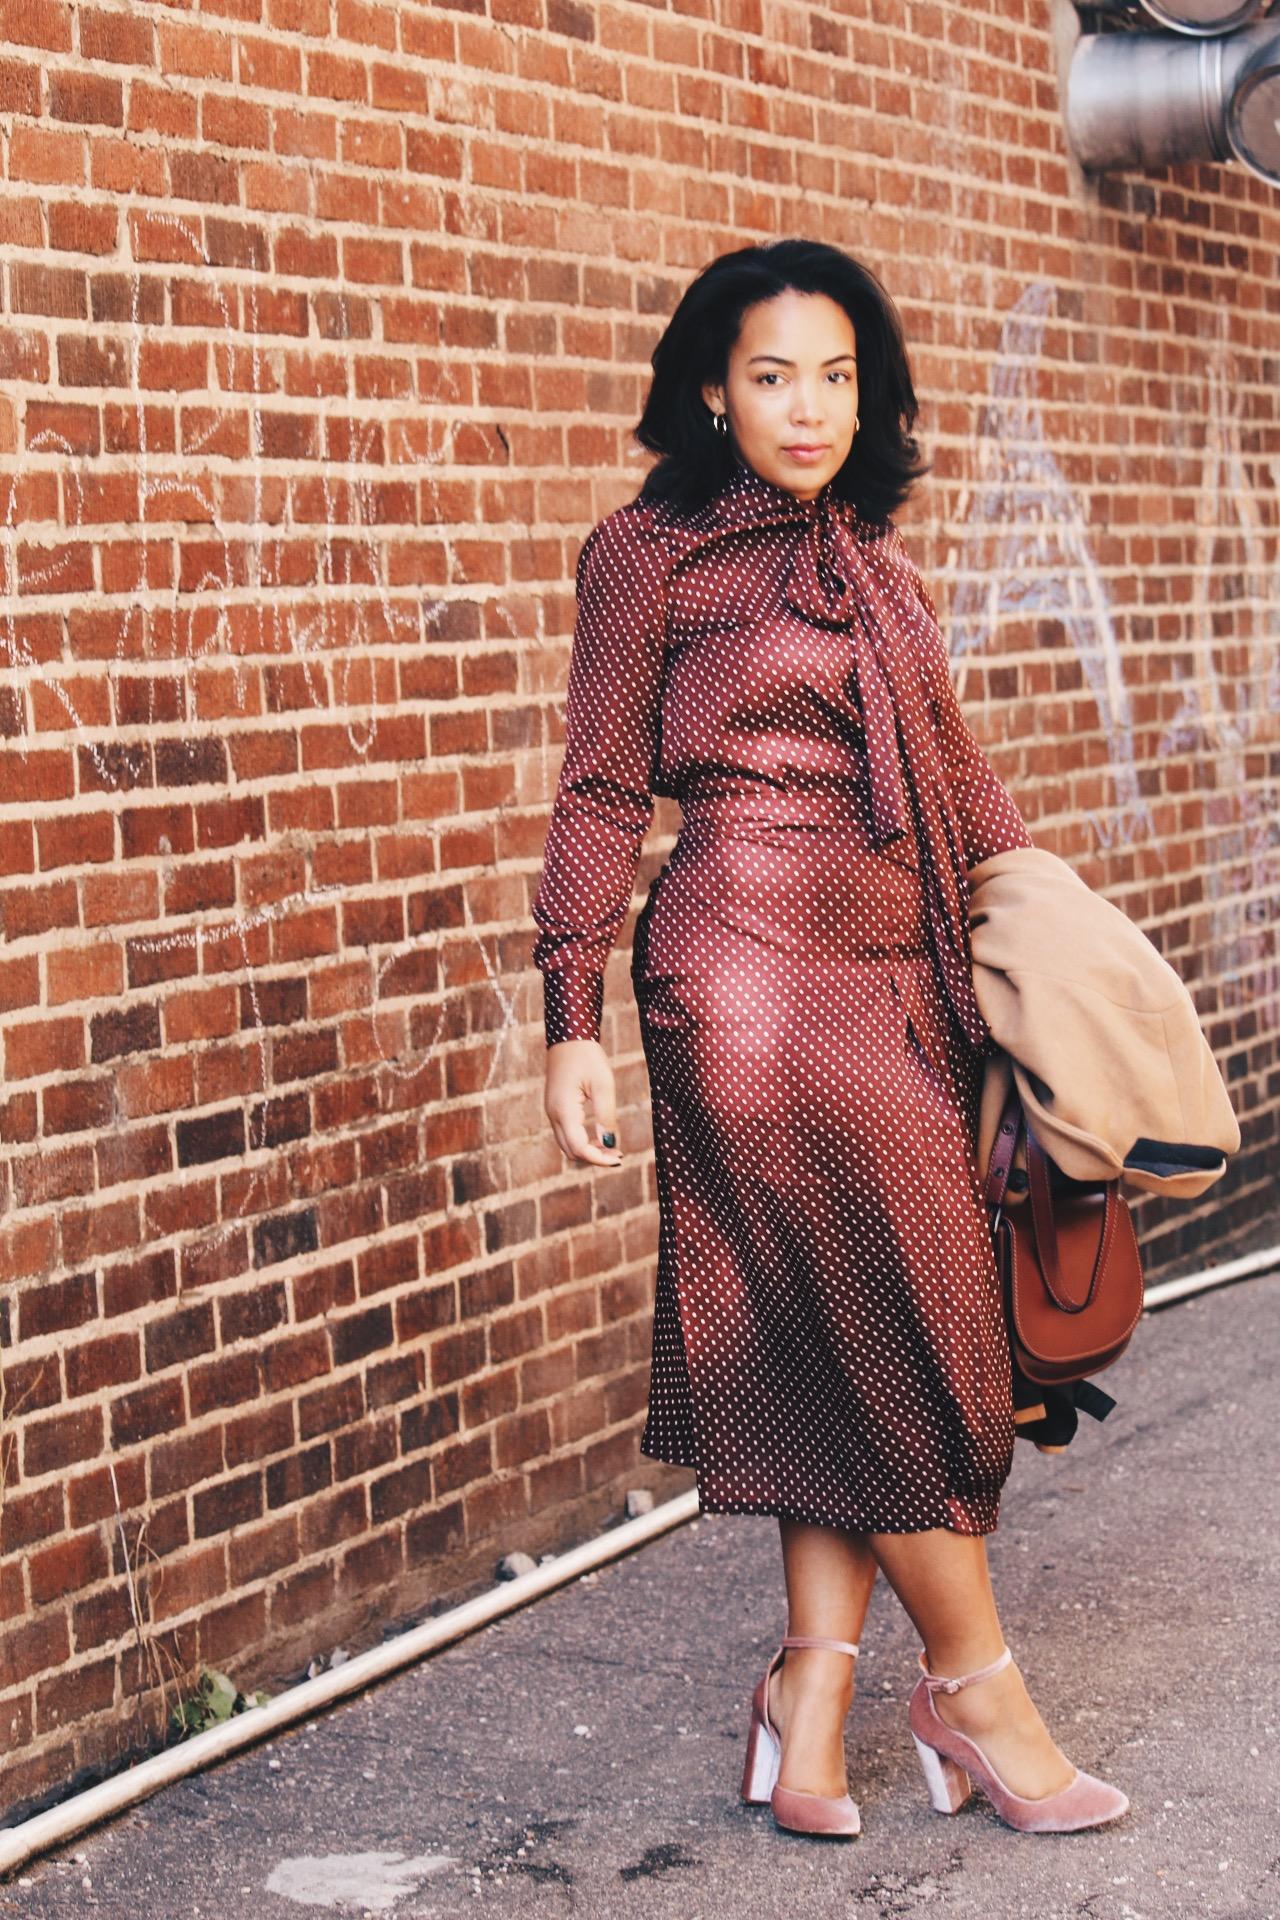 Zara-polka-dot-blouse-and-skirt-urban-outfitters-camel-coat-coach-saddle-bag-topshop-gracie-velvet-heels-similar-aquazurra-alix-pumps-womens-workwear-fashion-9.JPG